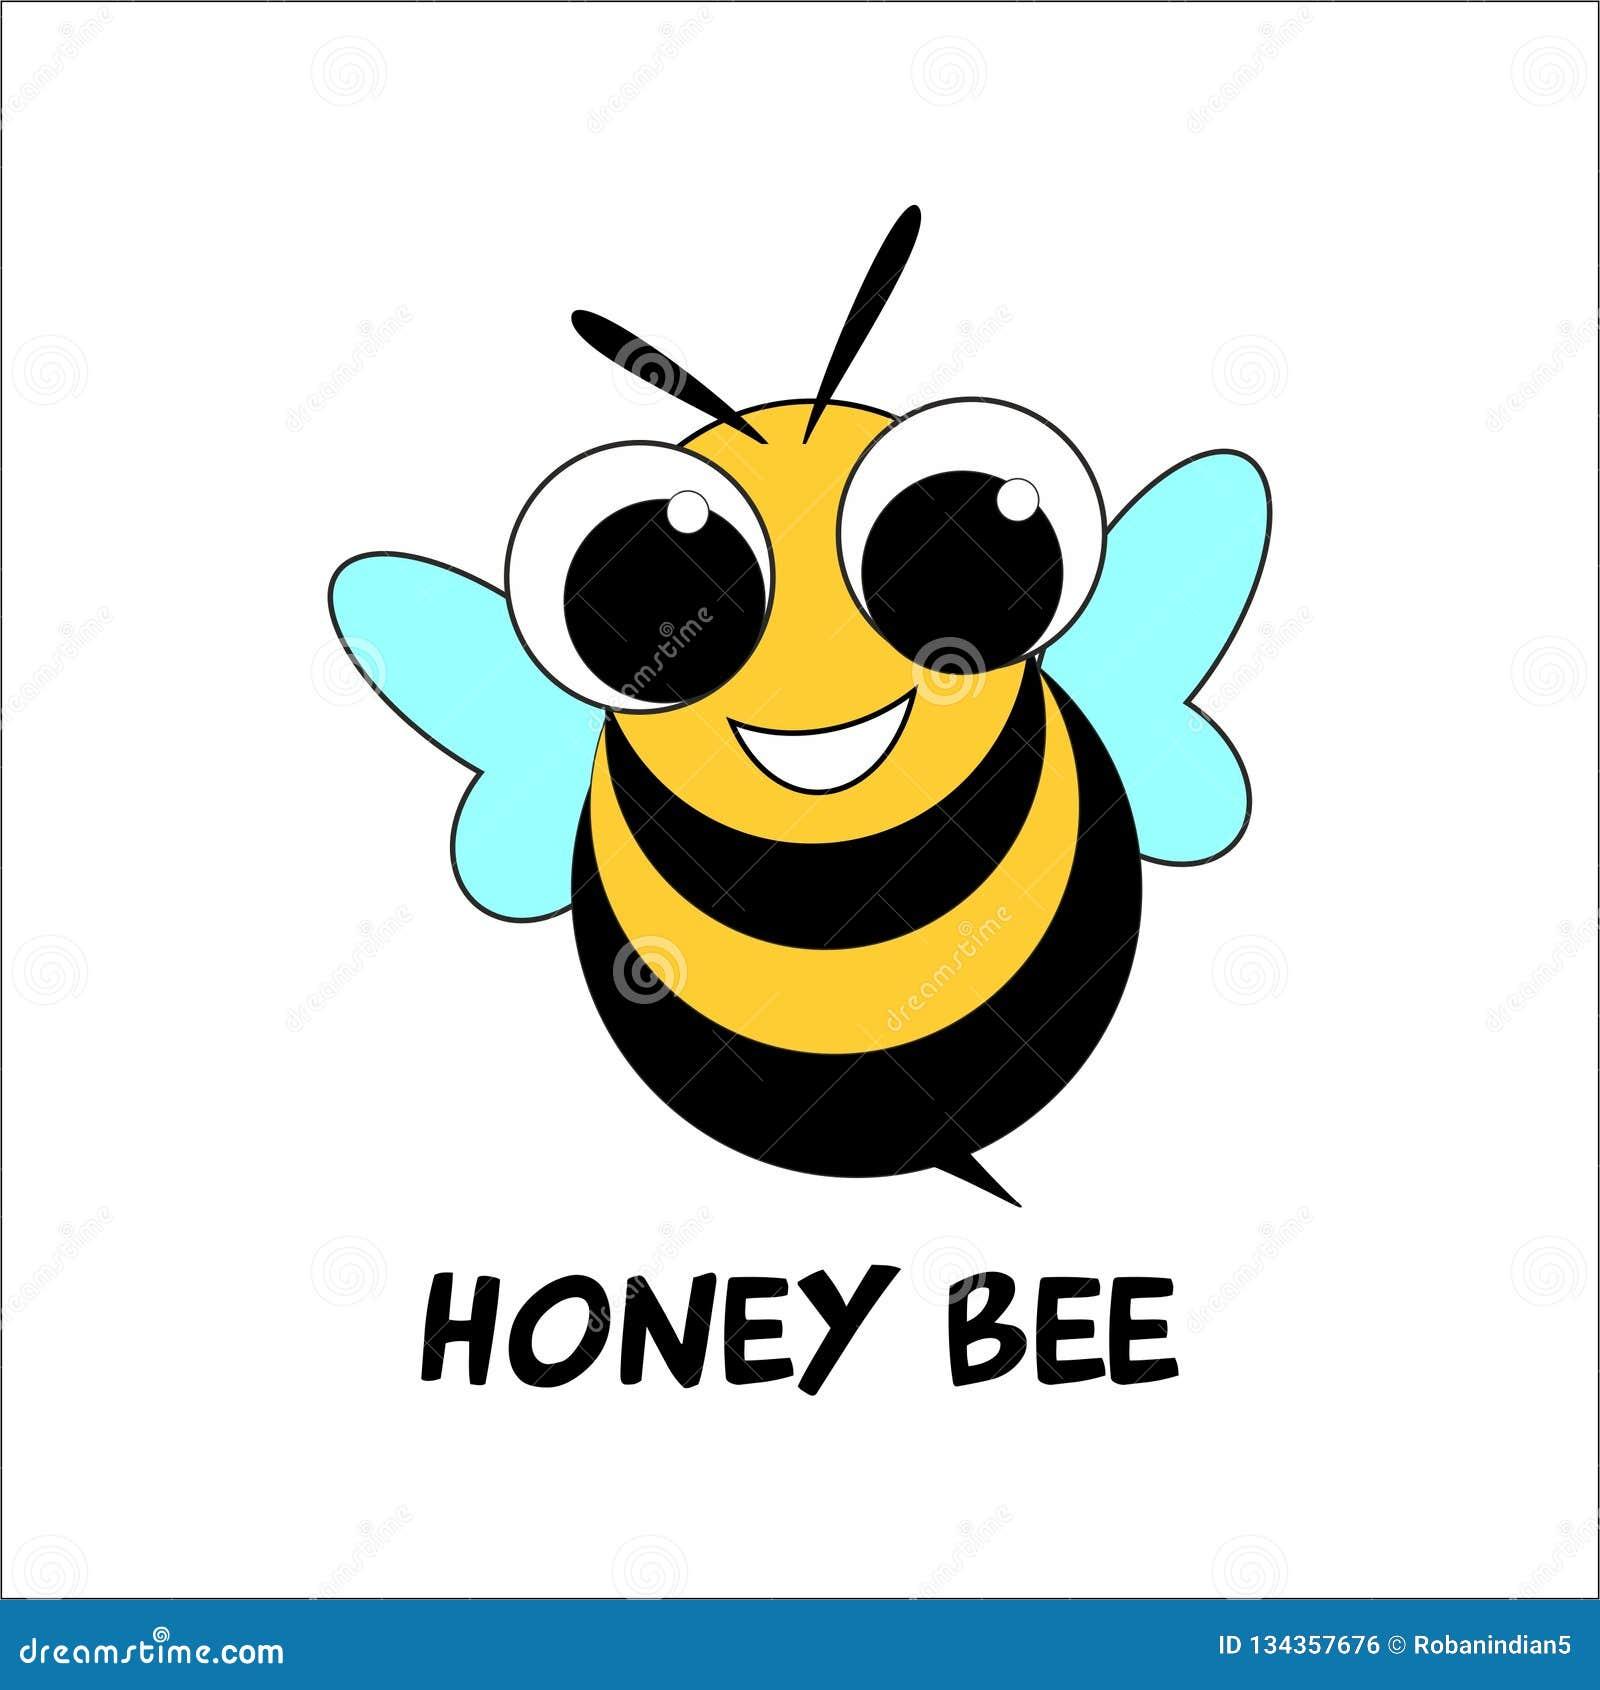 Cute Honey Bee Logo Design Stock Vector. Illustration Of